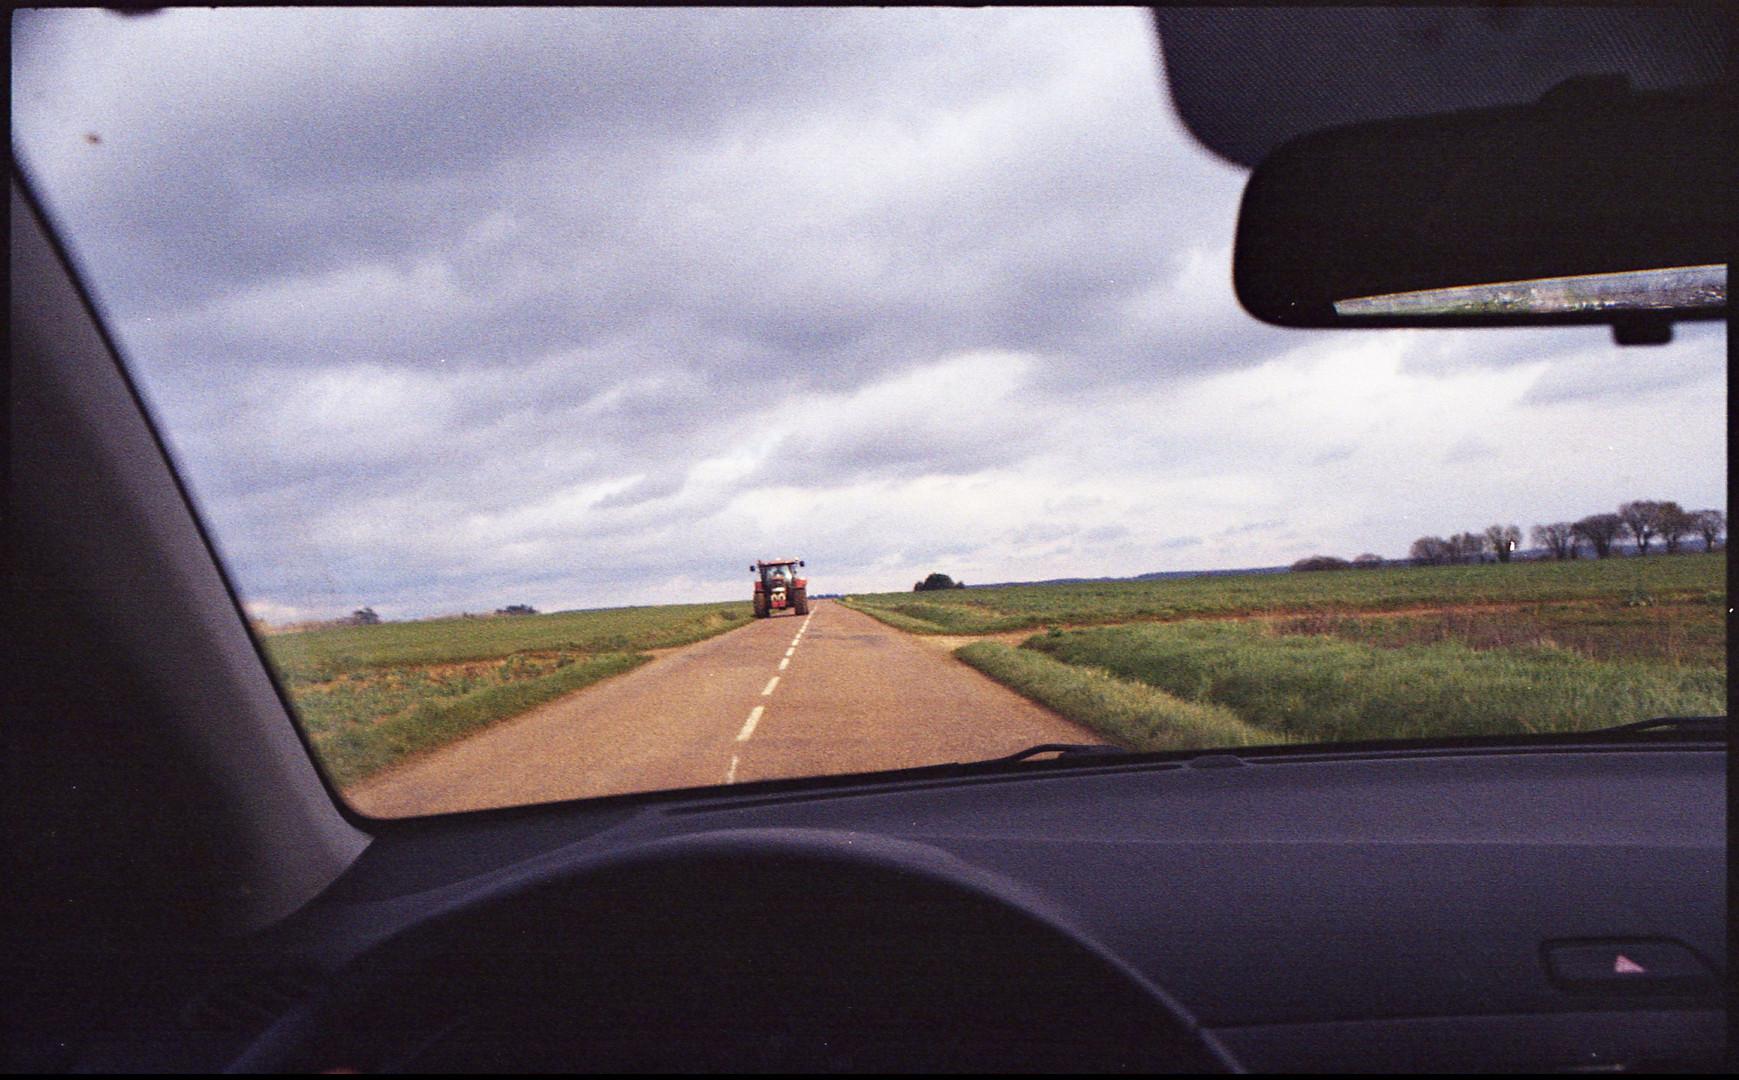 SA_Tracteur.jpg